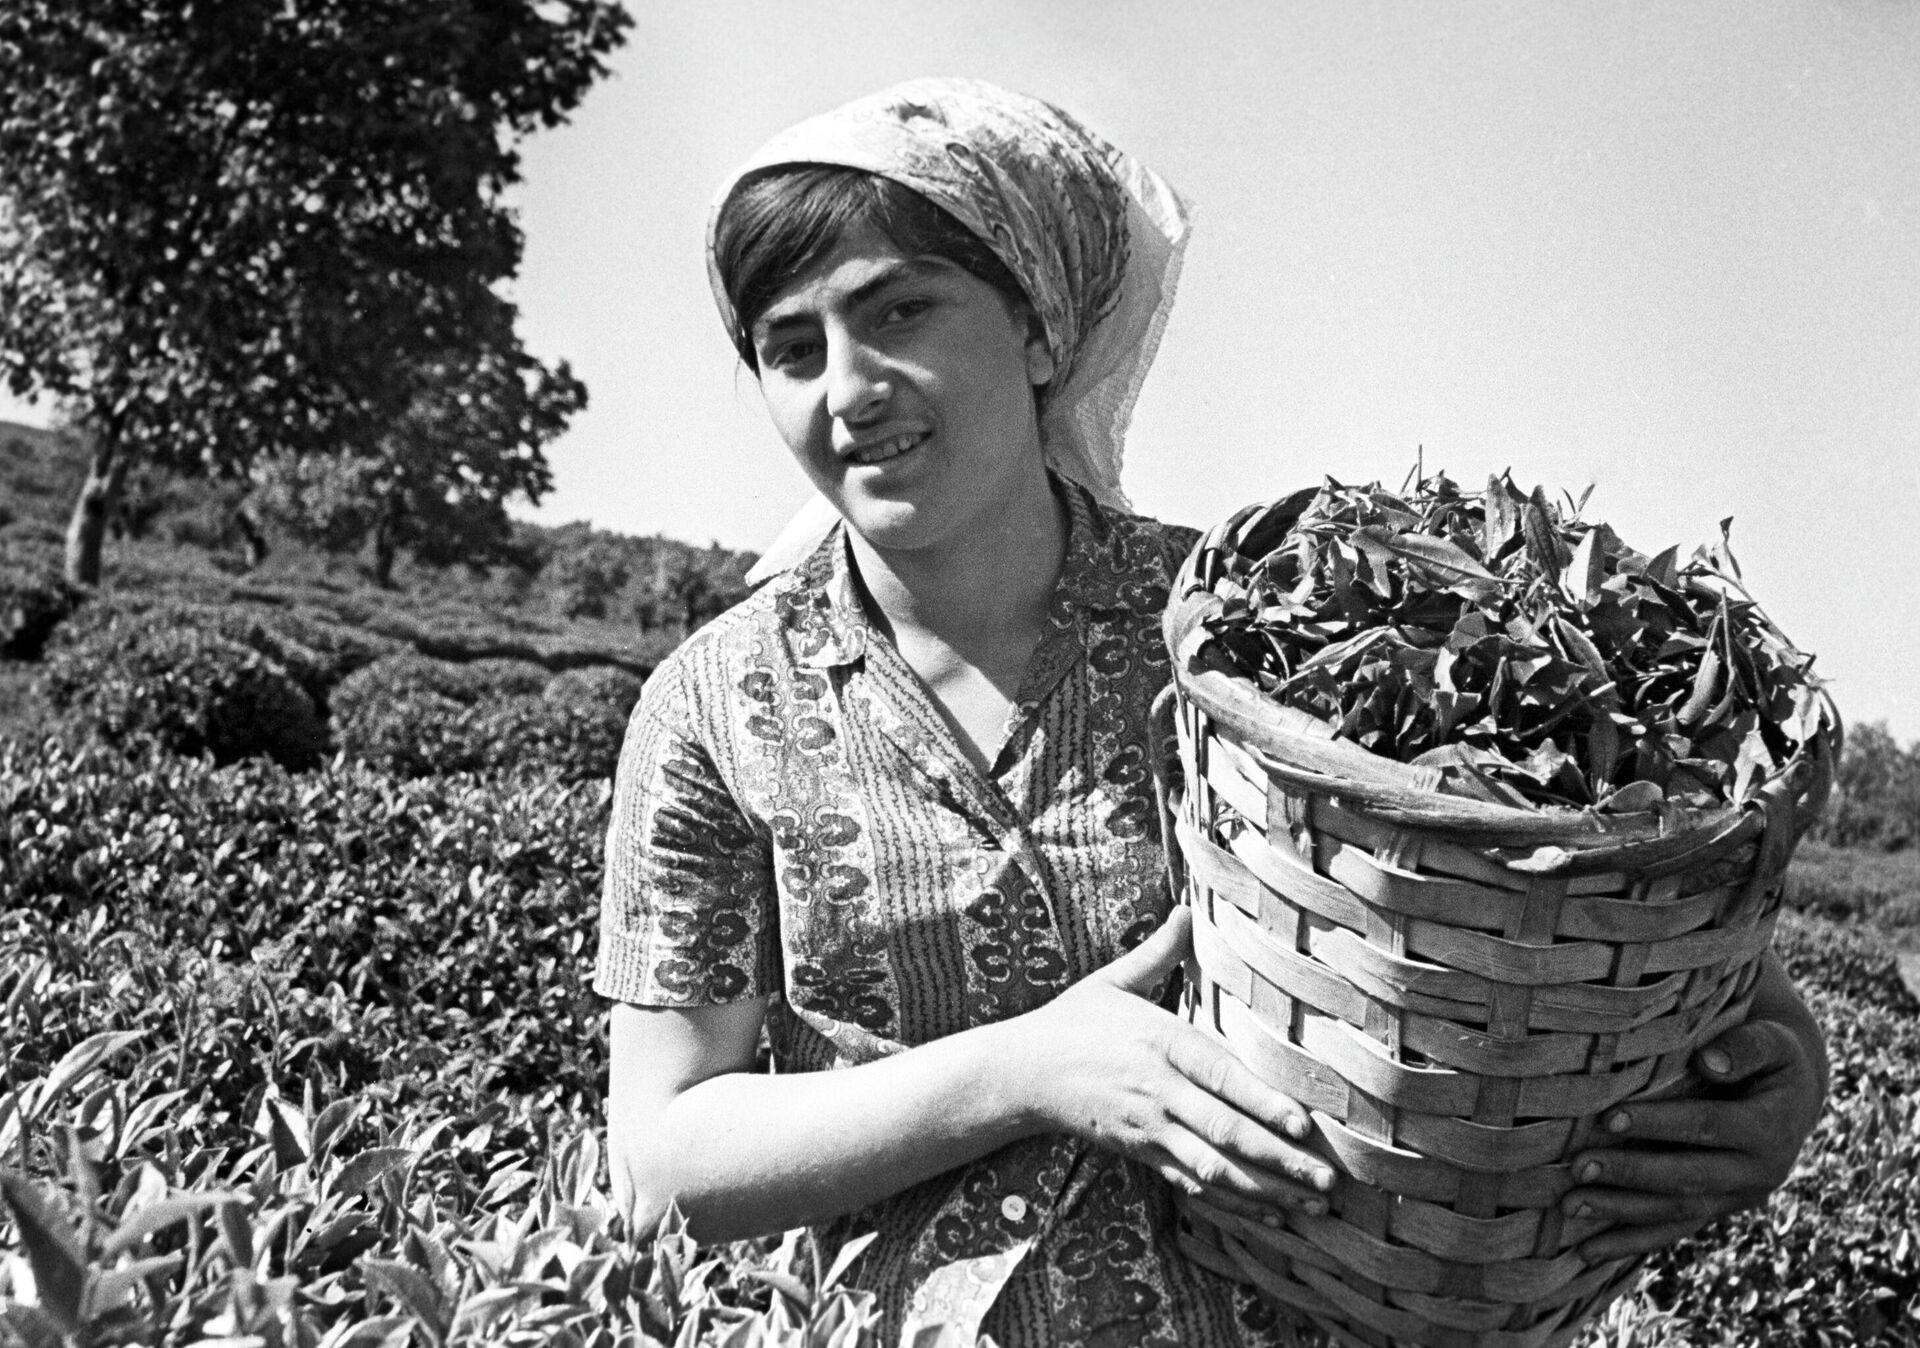 Una mujer cosecha té en los valles de la República Socialista Soviética de Georgia - Sputnik Mundo, 1920, 07.09.2021